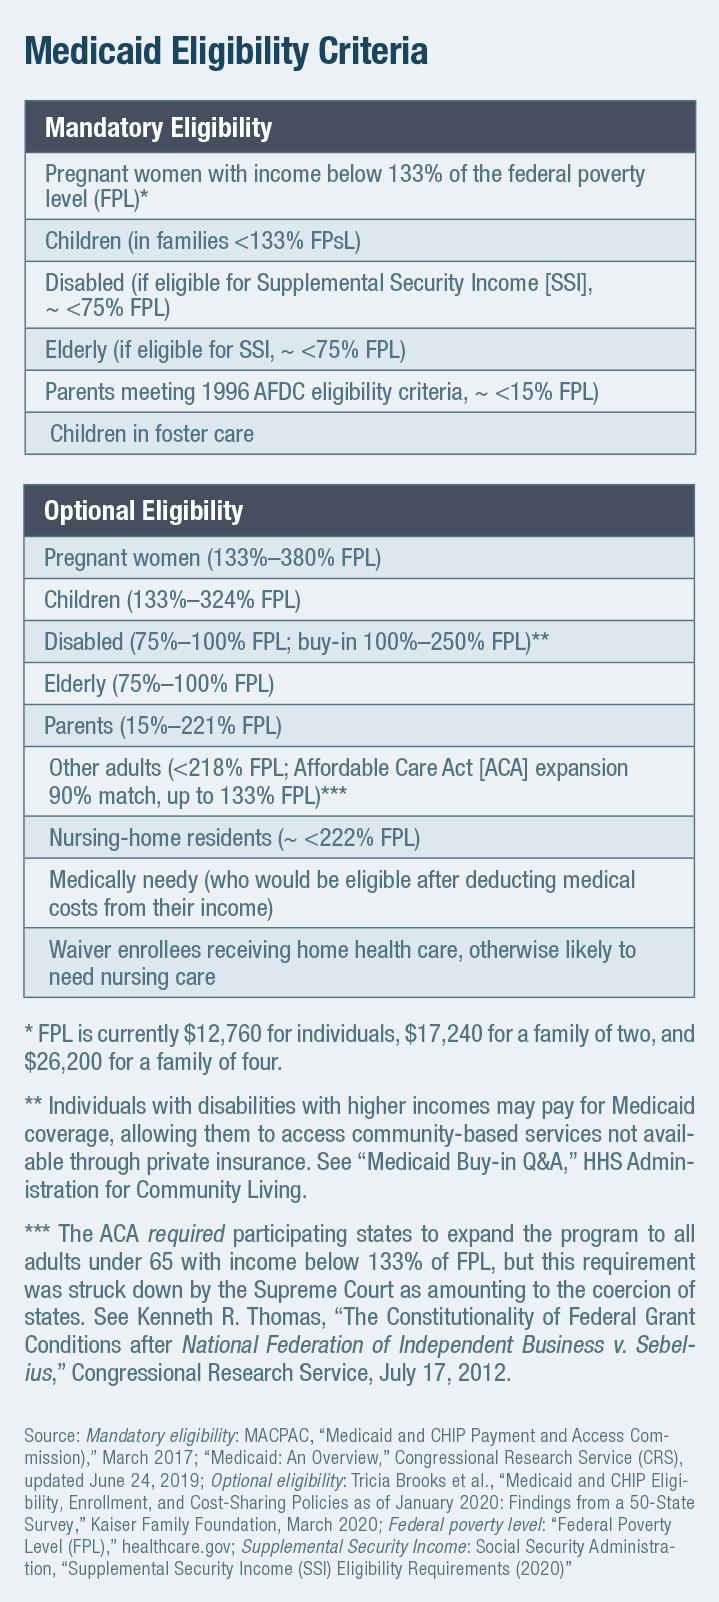 Medicaid Eligibility Criteria